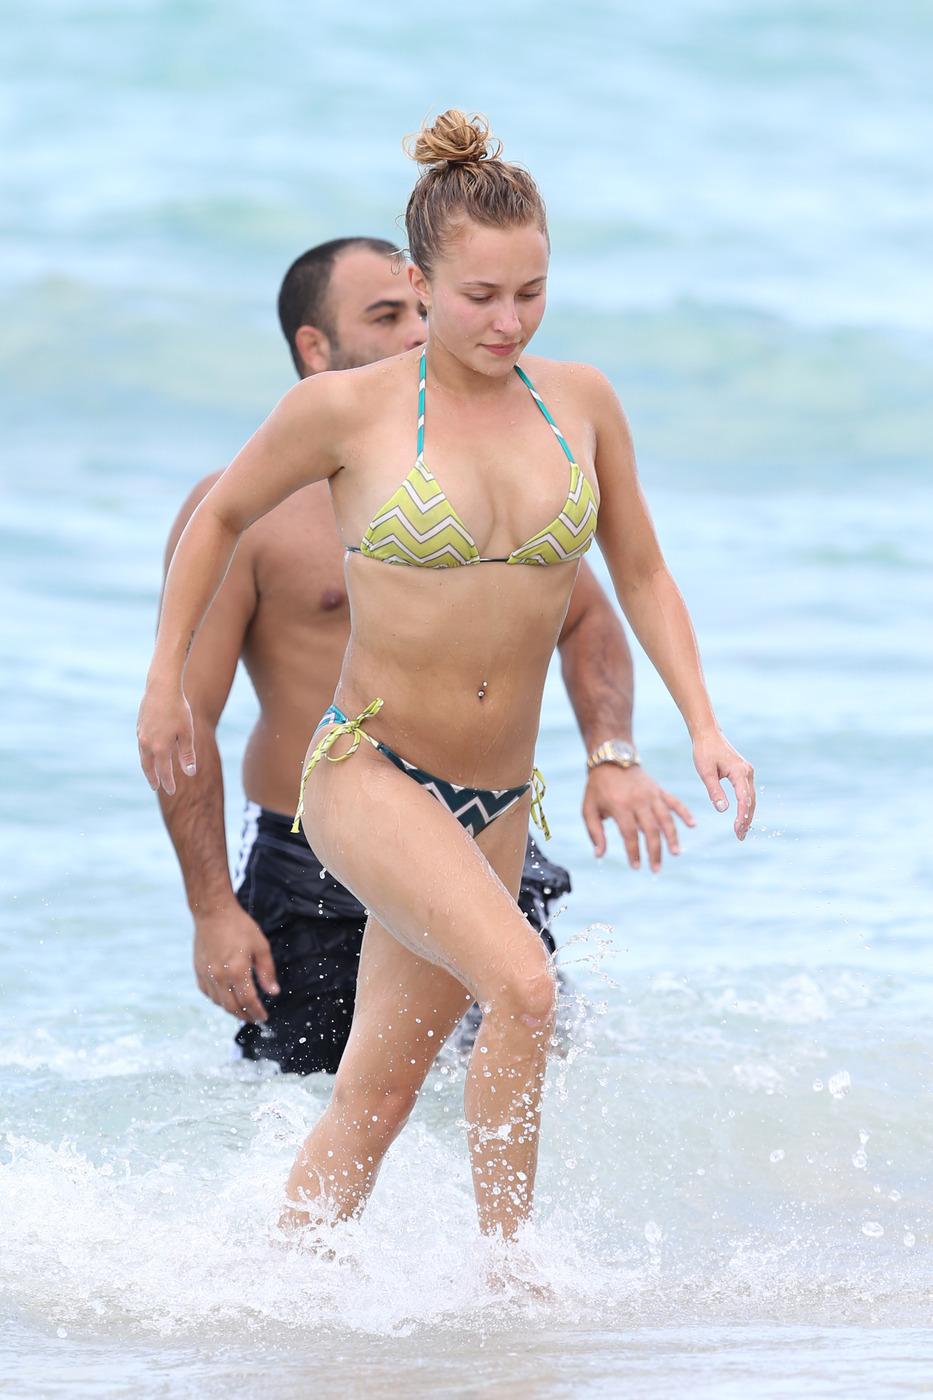 bikini Hayden pantiere